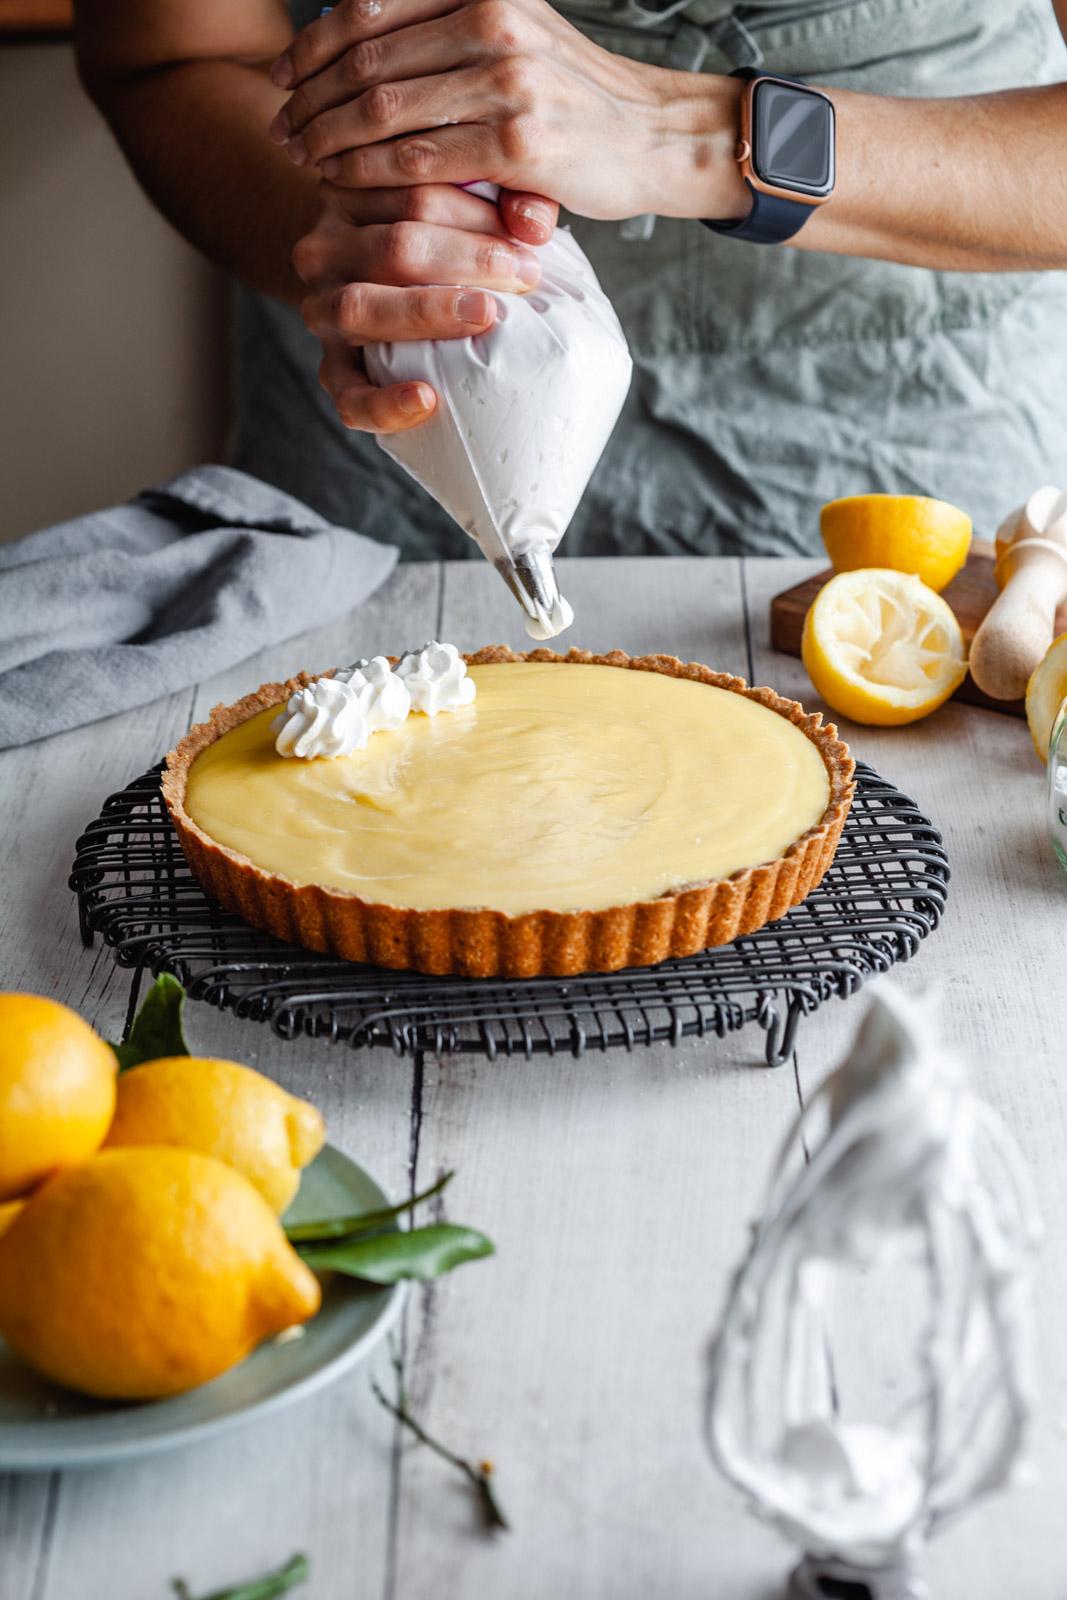 Gluten Free Lemon Custard Cream Tart With Swiss Meringue